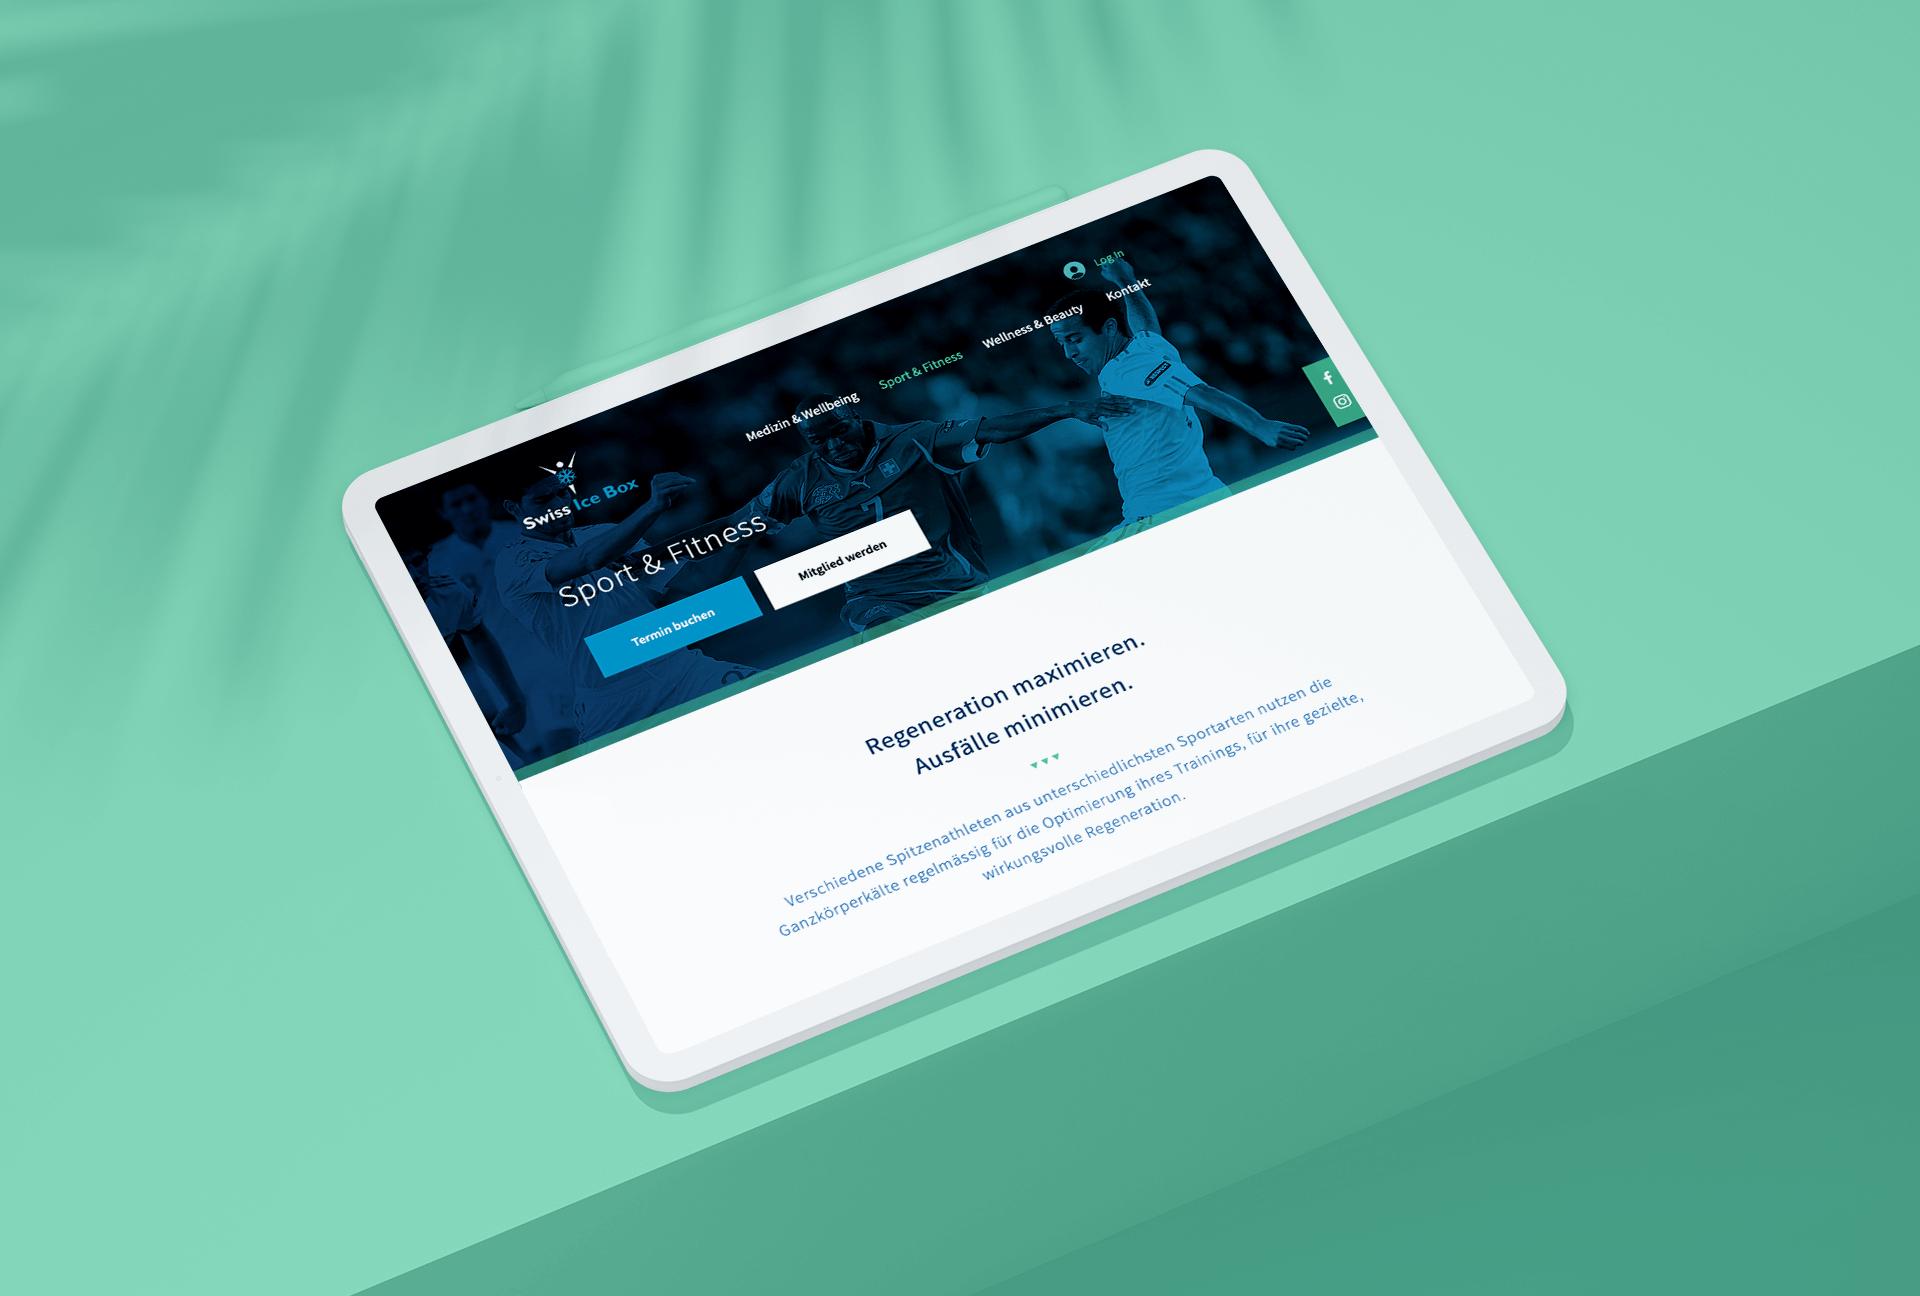 SwissIceBox_iPad_2.png